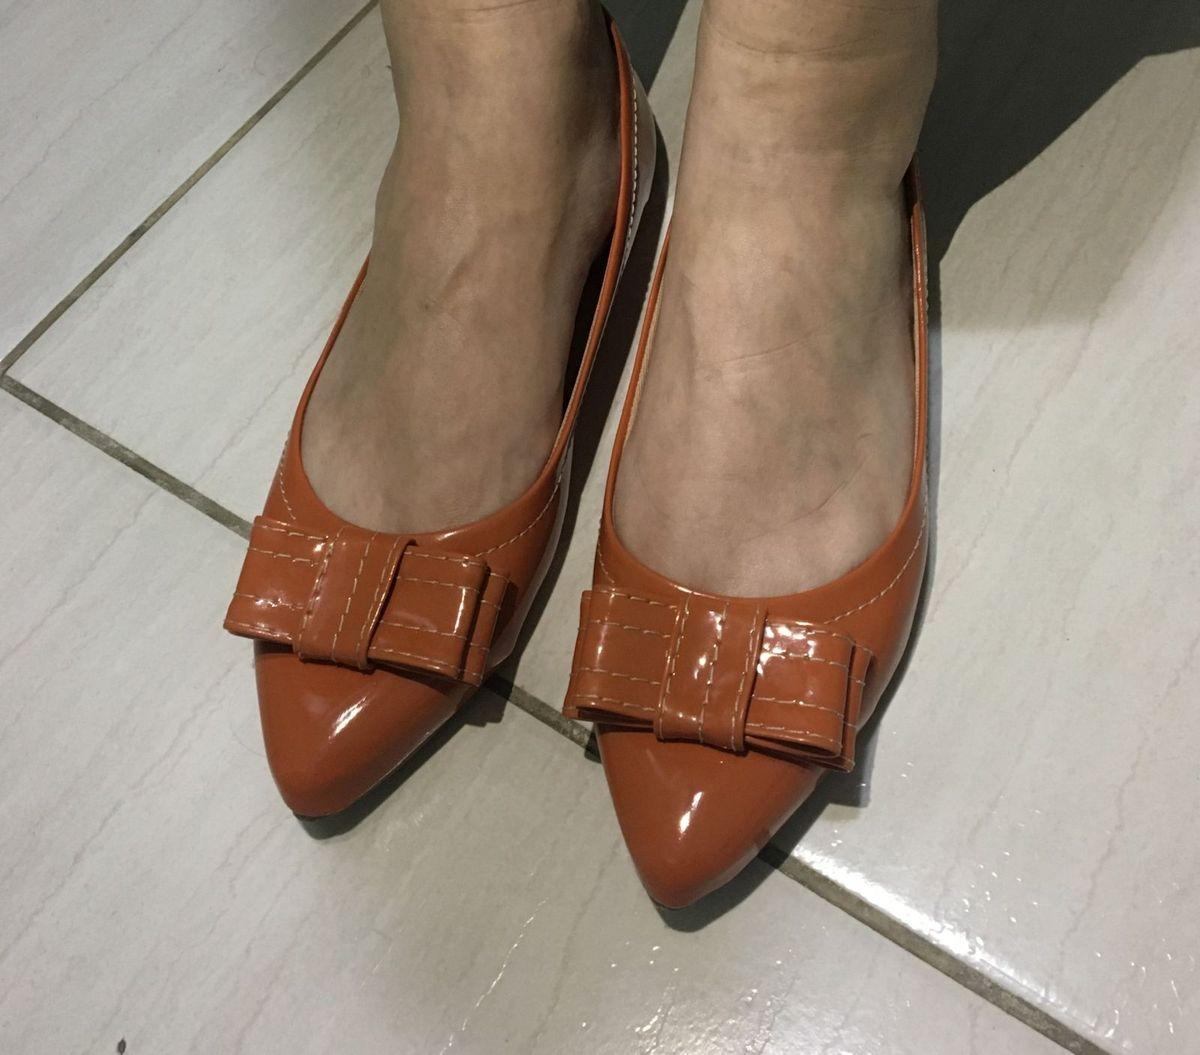 dad759cc8 sapatilha laranja - sapatilha vi calçados.  Czm6ly9wag90b3muzw5qb2vplmnvbs5ici9wcm9kdwn0cy80otg3ndg2l2q5mja1zjnlyjk3otizmzc0ztmwywe3mjnmywfiyjhmlmpwzw